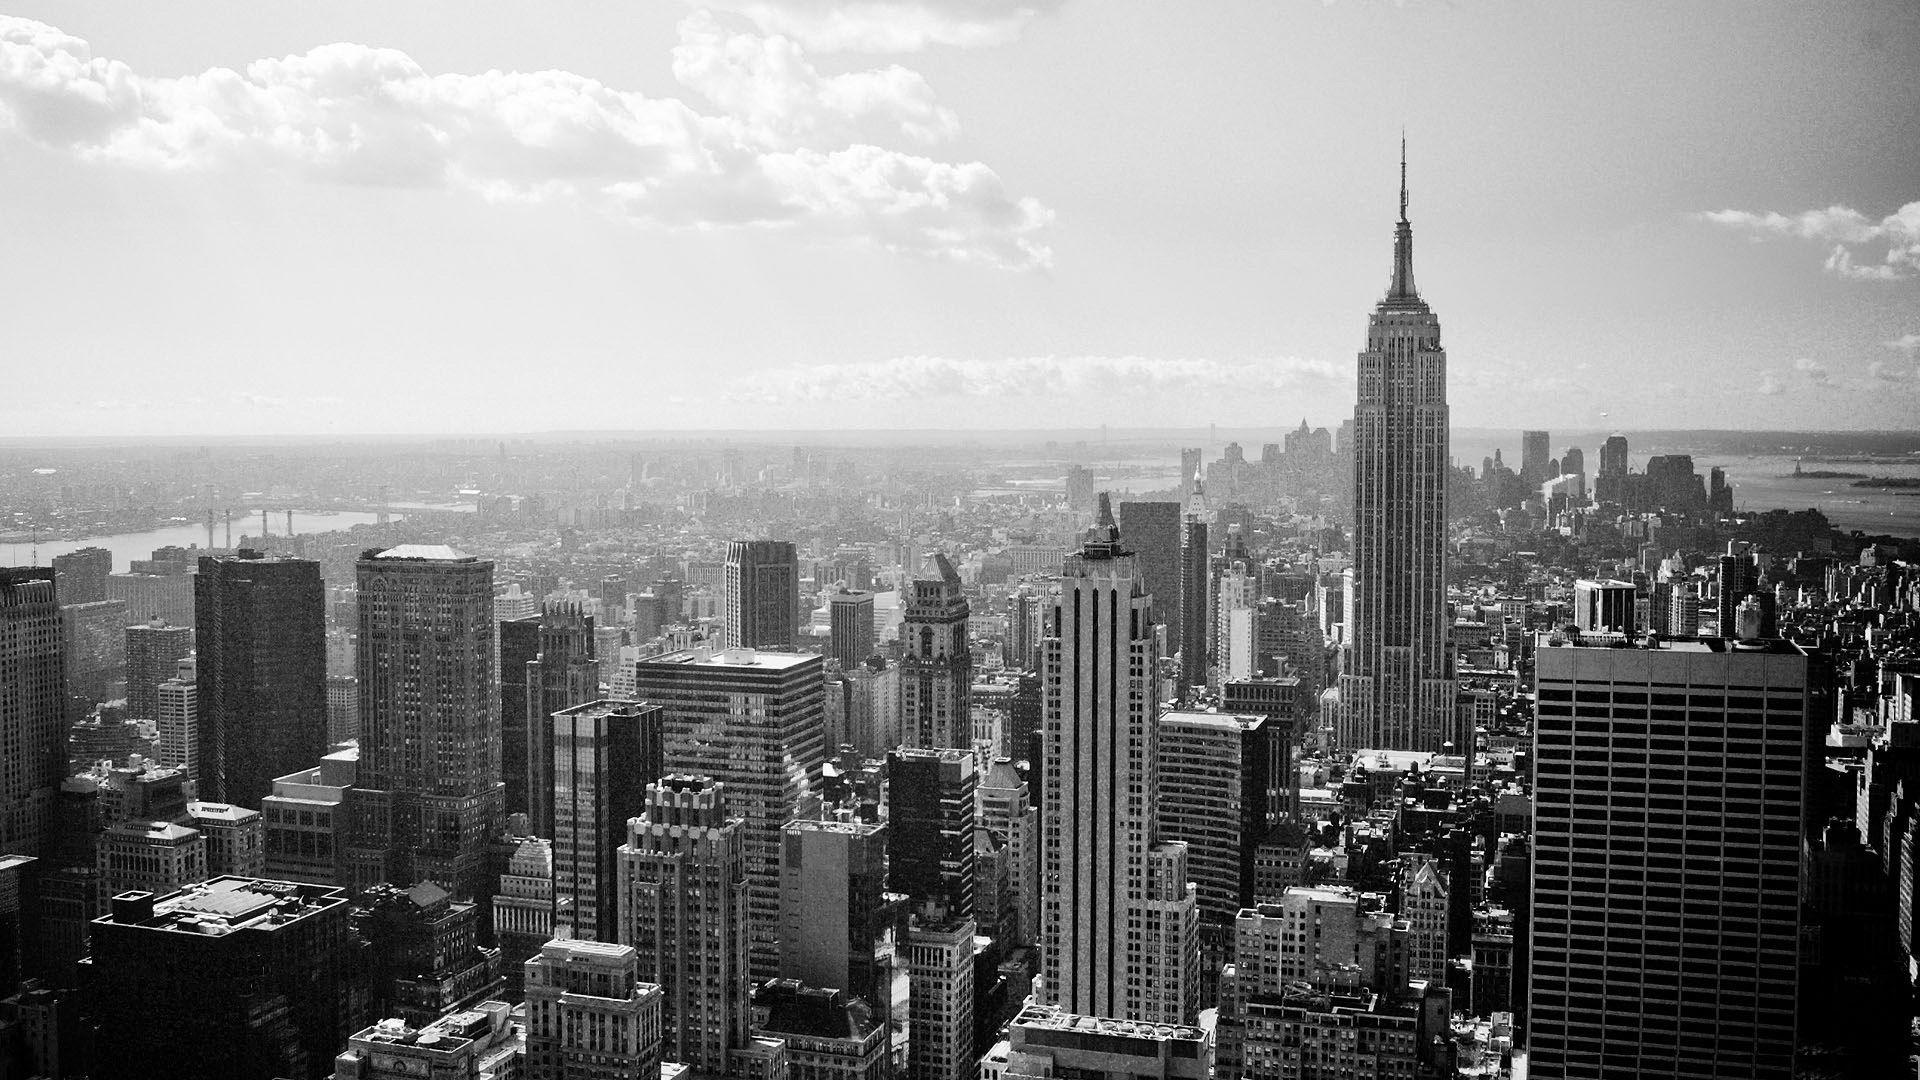 New York City Wallpaper Hd Images Skajlajn Cherno Beloe Manhetten